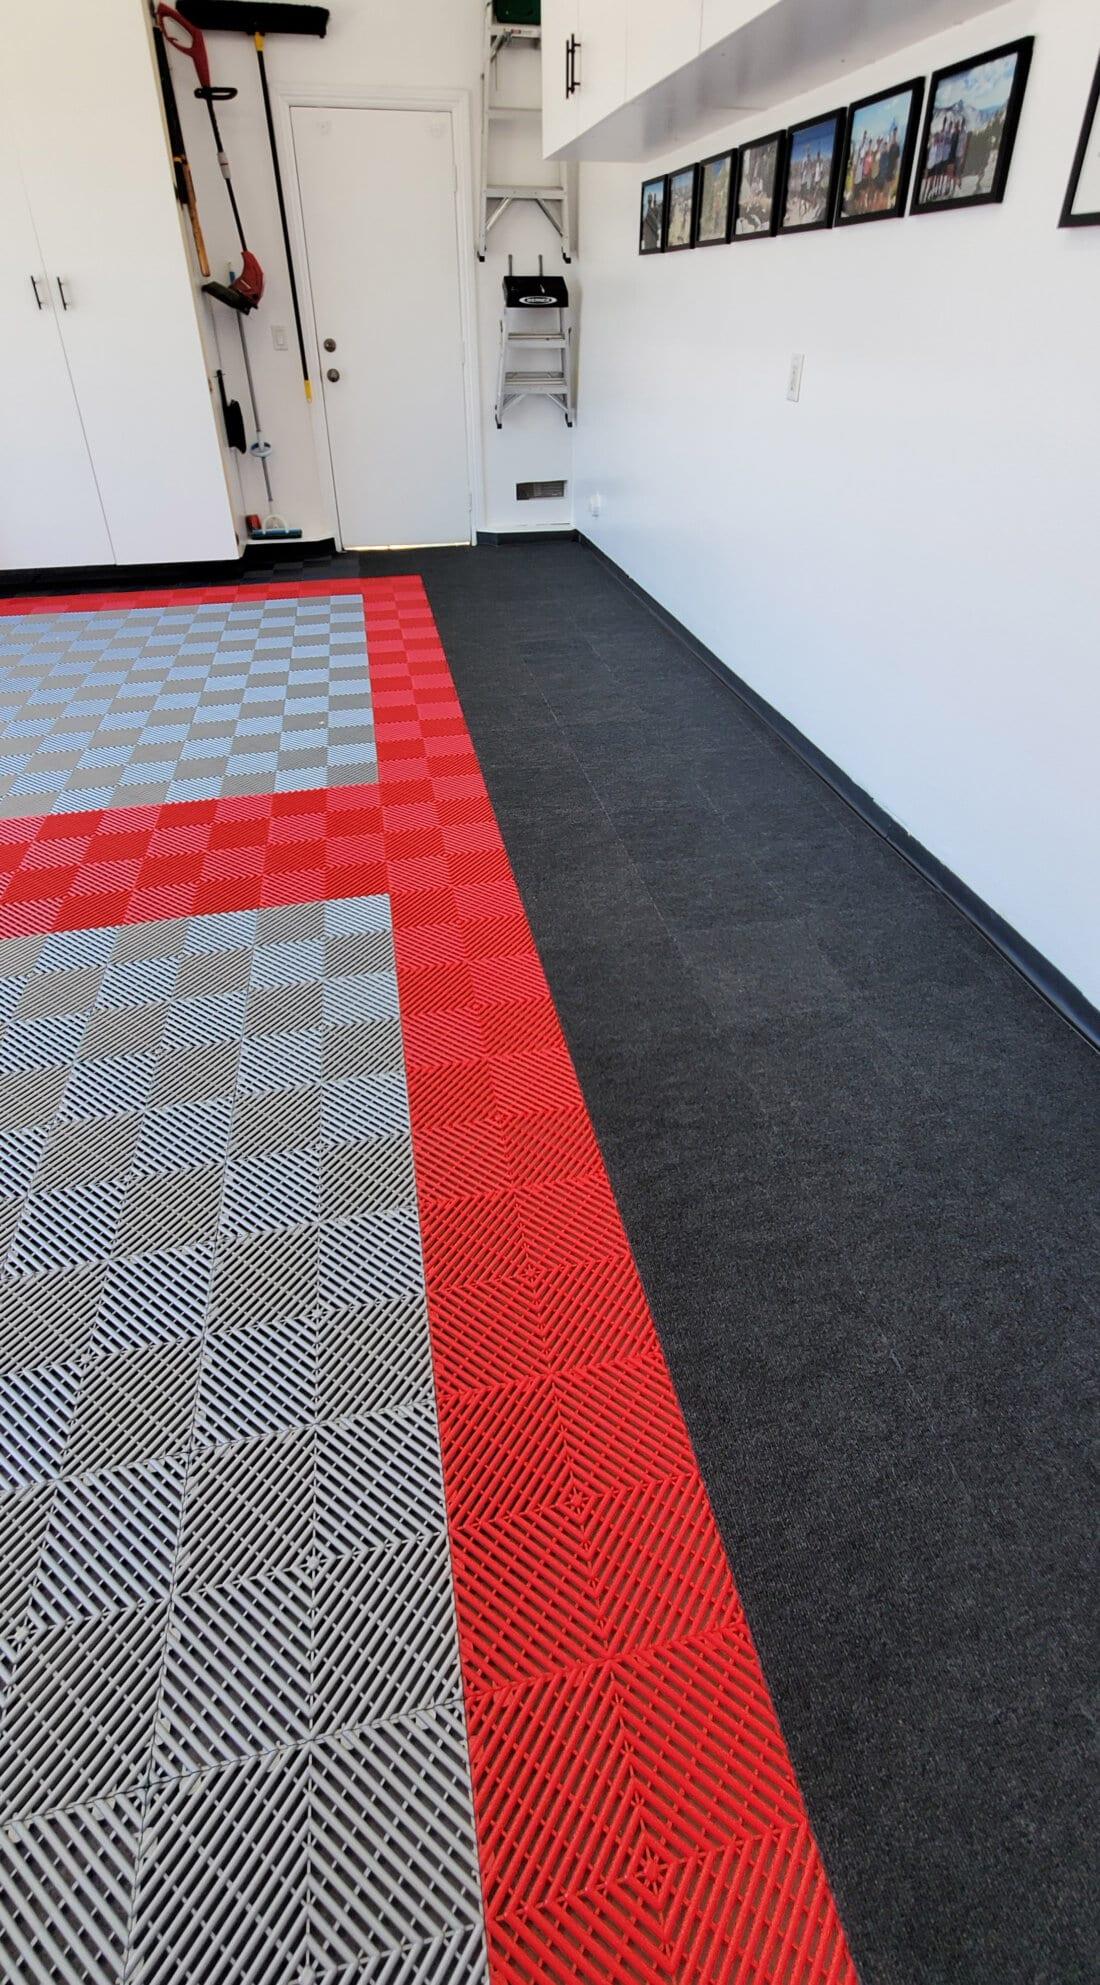 Neil's Ribbed garage floor